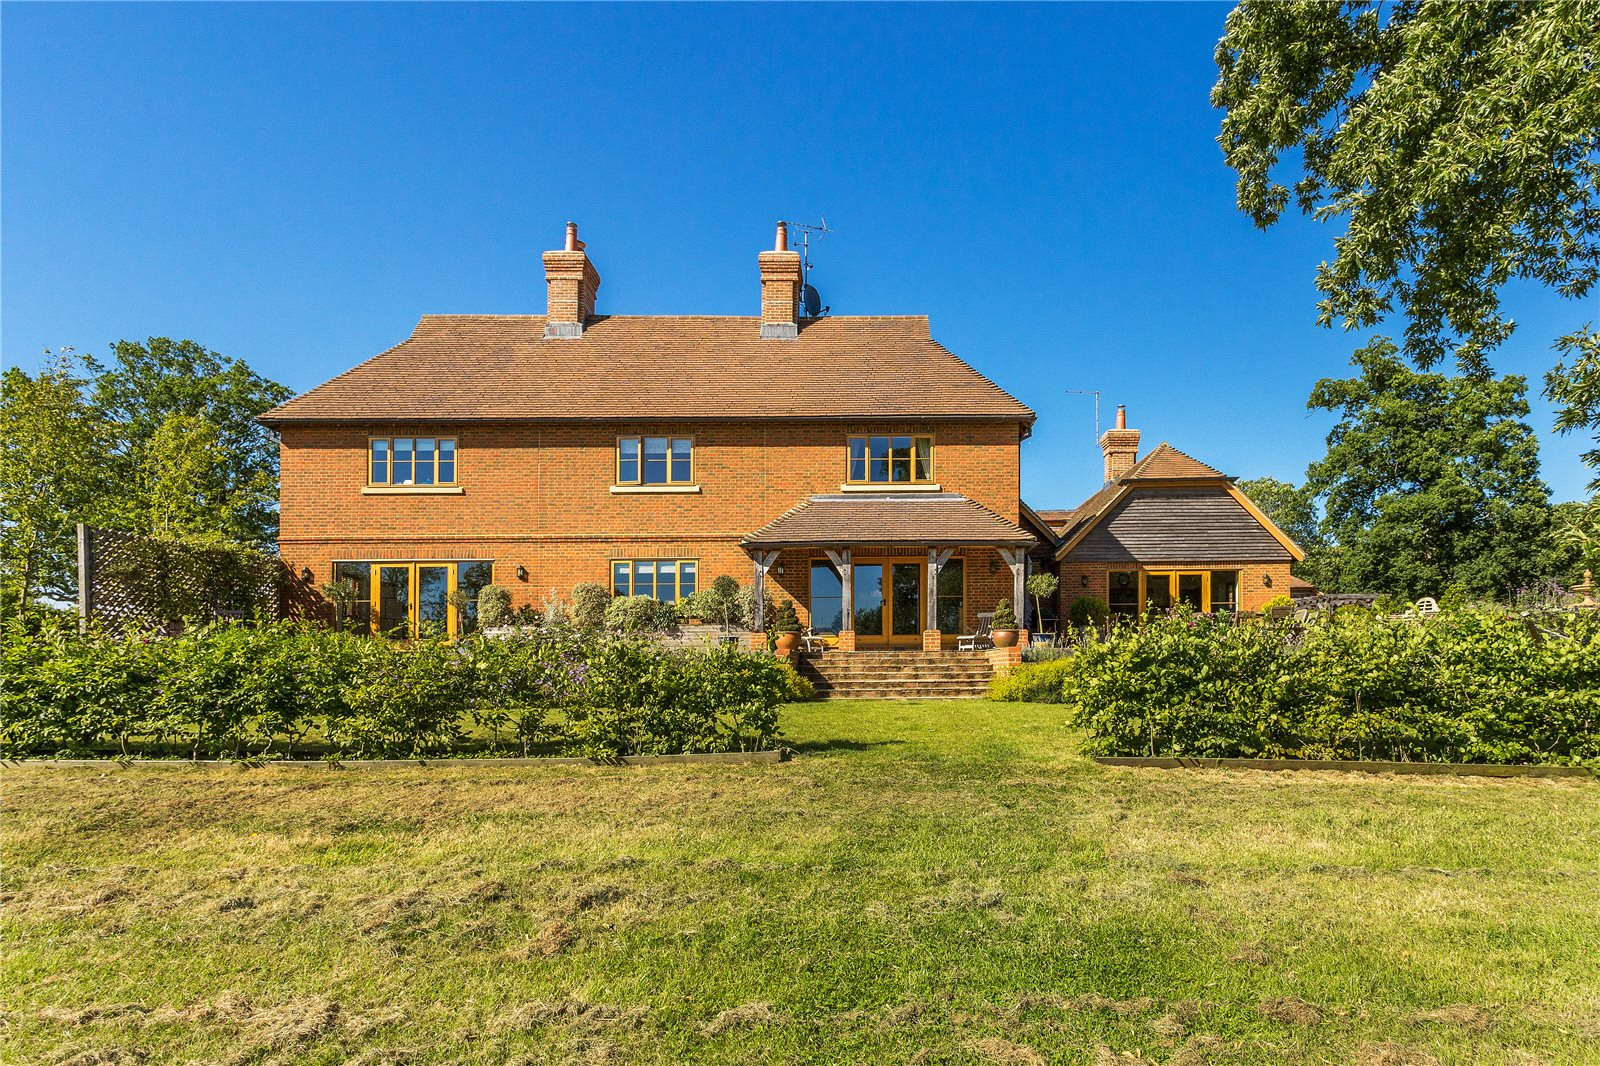 独户住宅 为 销售 在 Farnham Road, Ewshot, Farnham, Surrey, GU10 Farnham, 英格兰